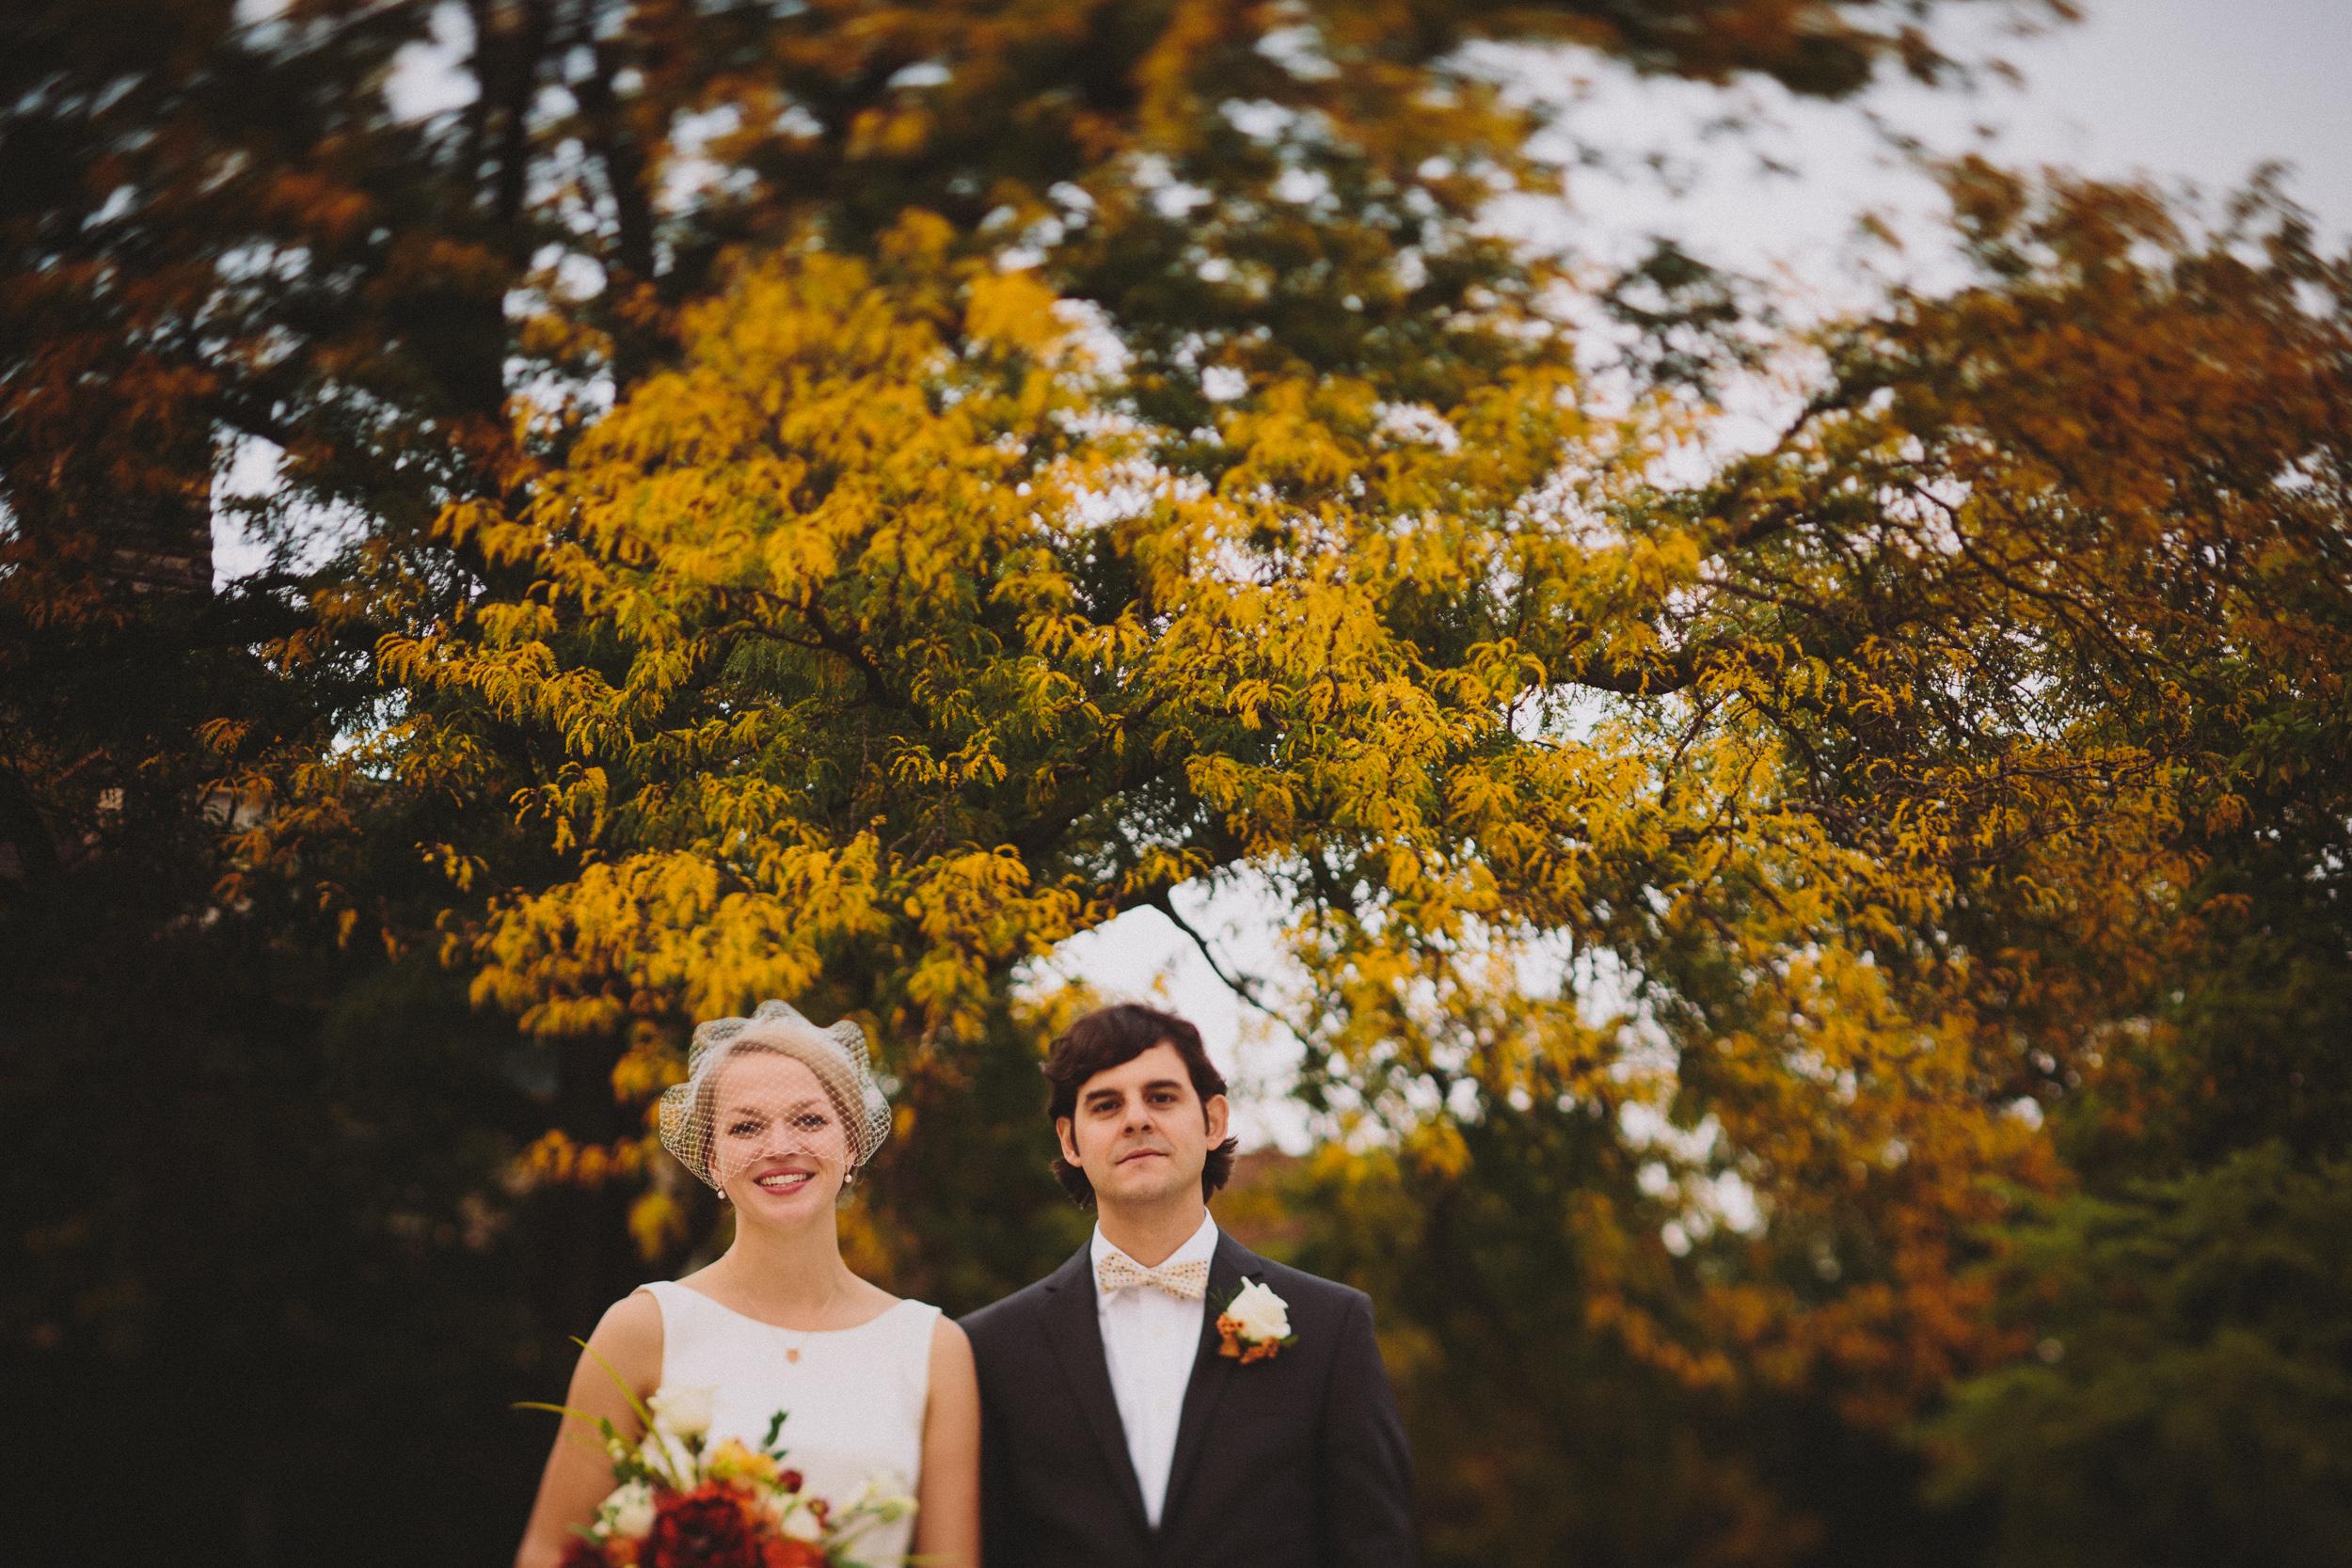 10-05-2013 maggie & adam wedding photography by brian milo-149.jpg